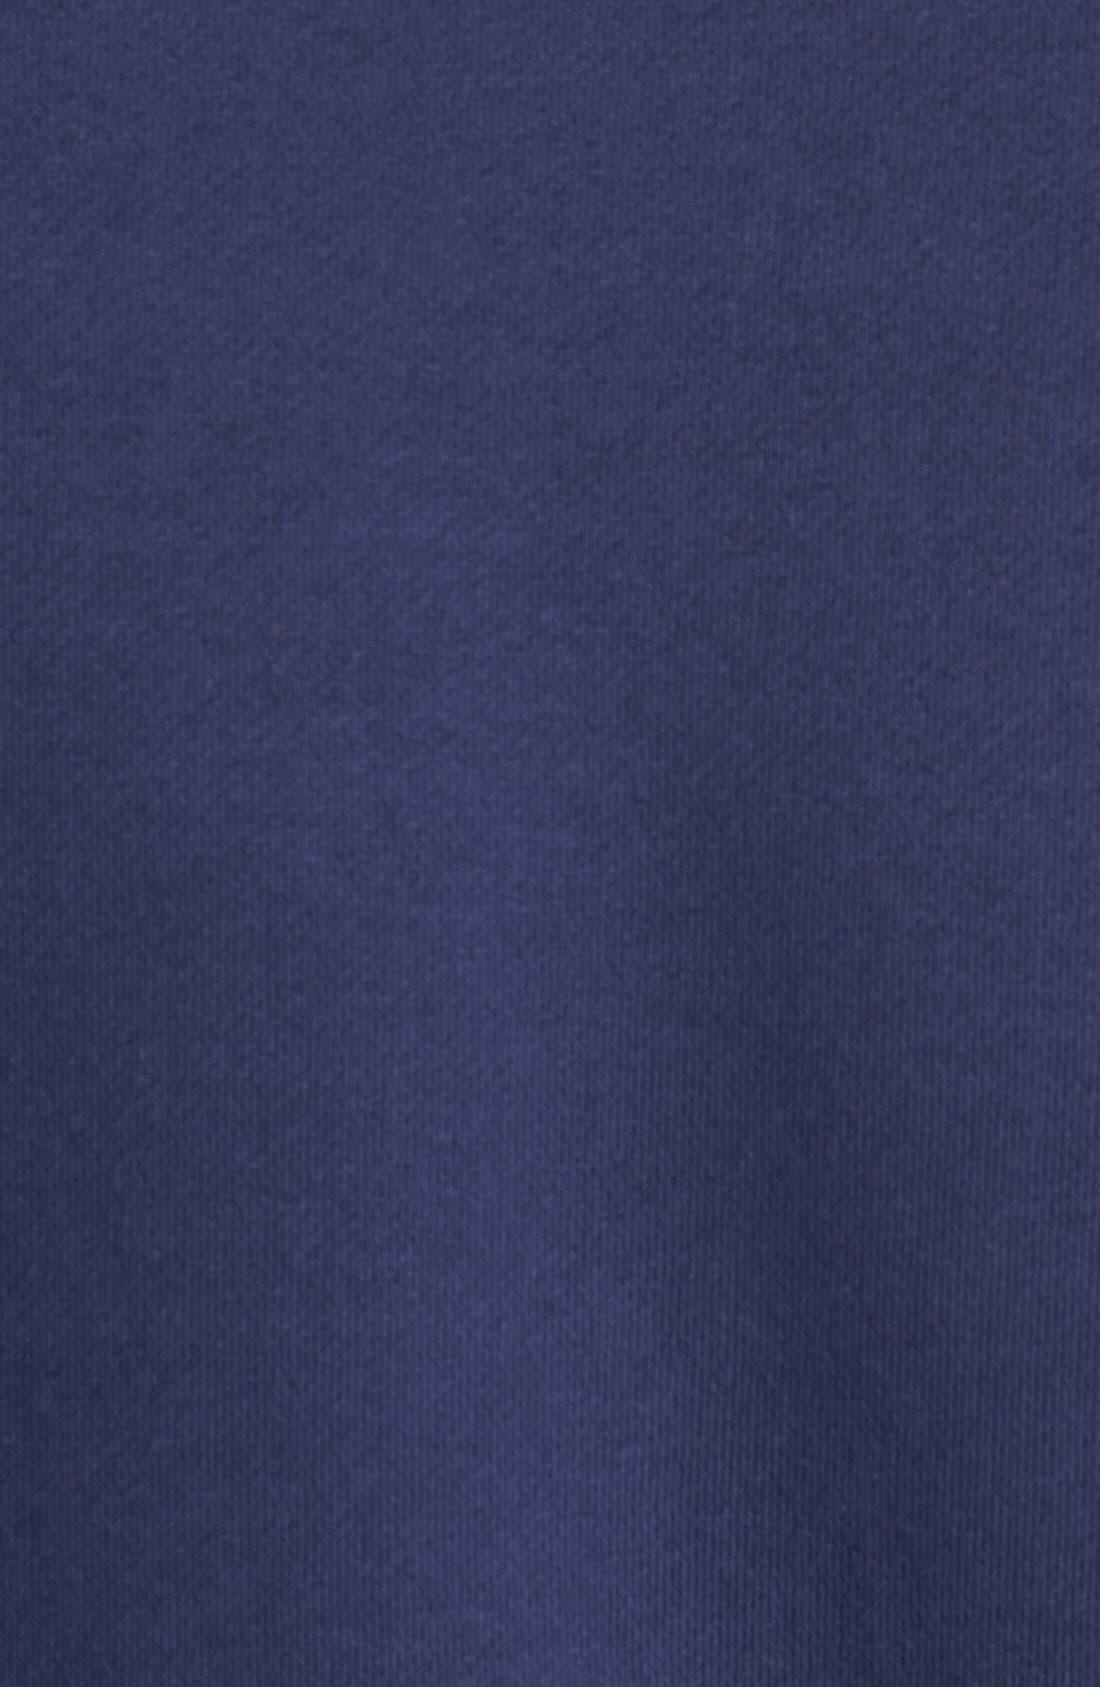 Alternate Image 3  - Mitchell & Ness 'Syracuse' Sweatshirt